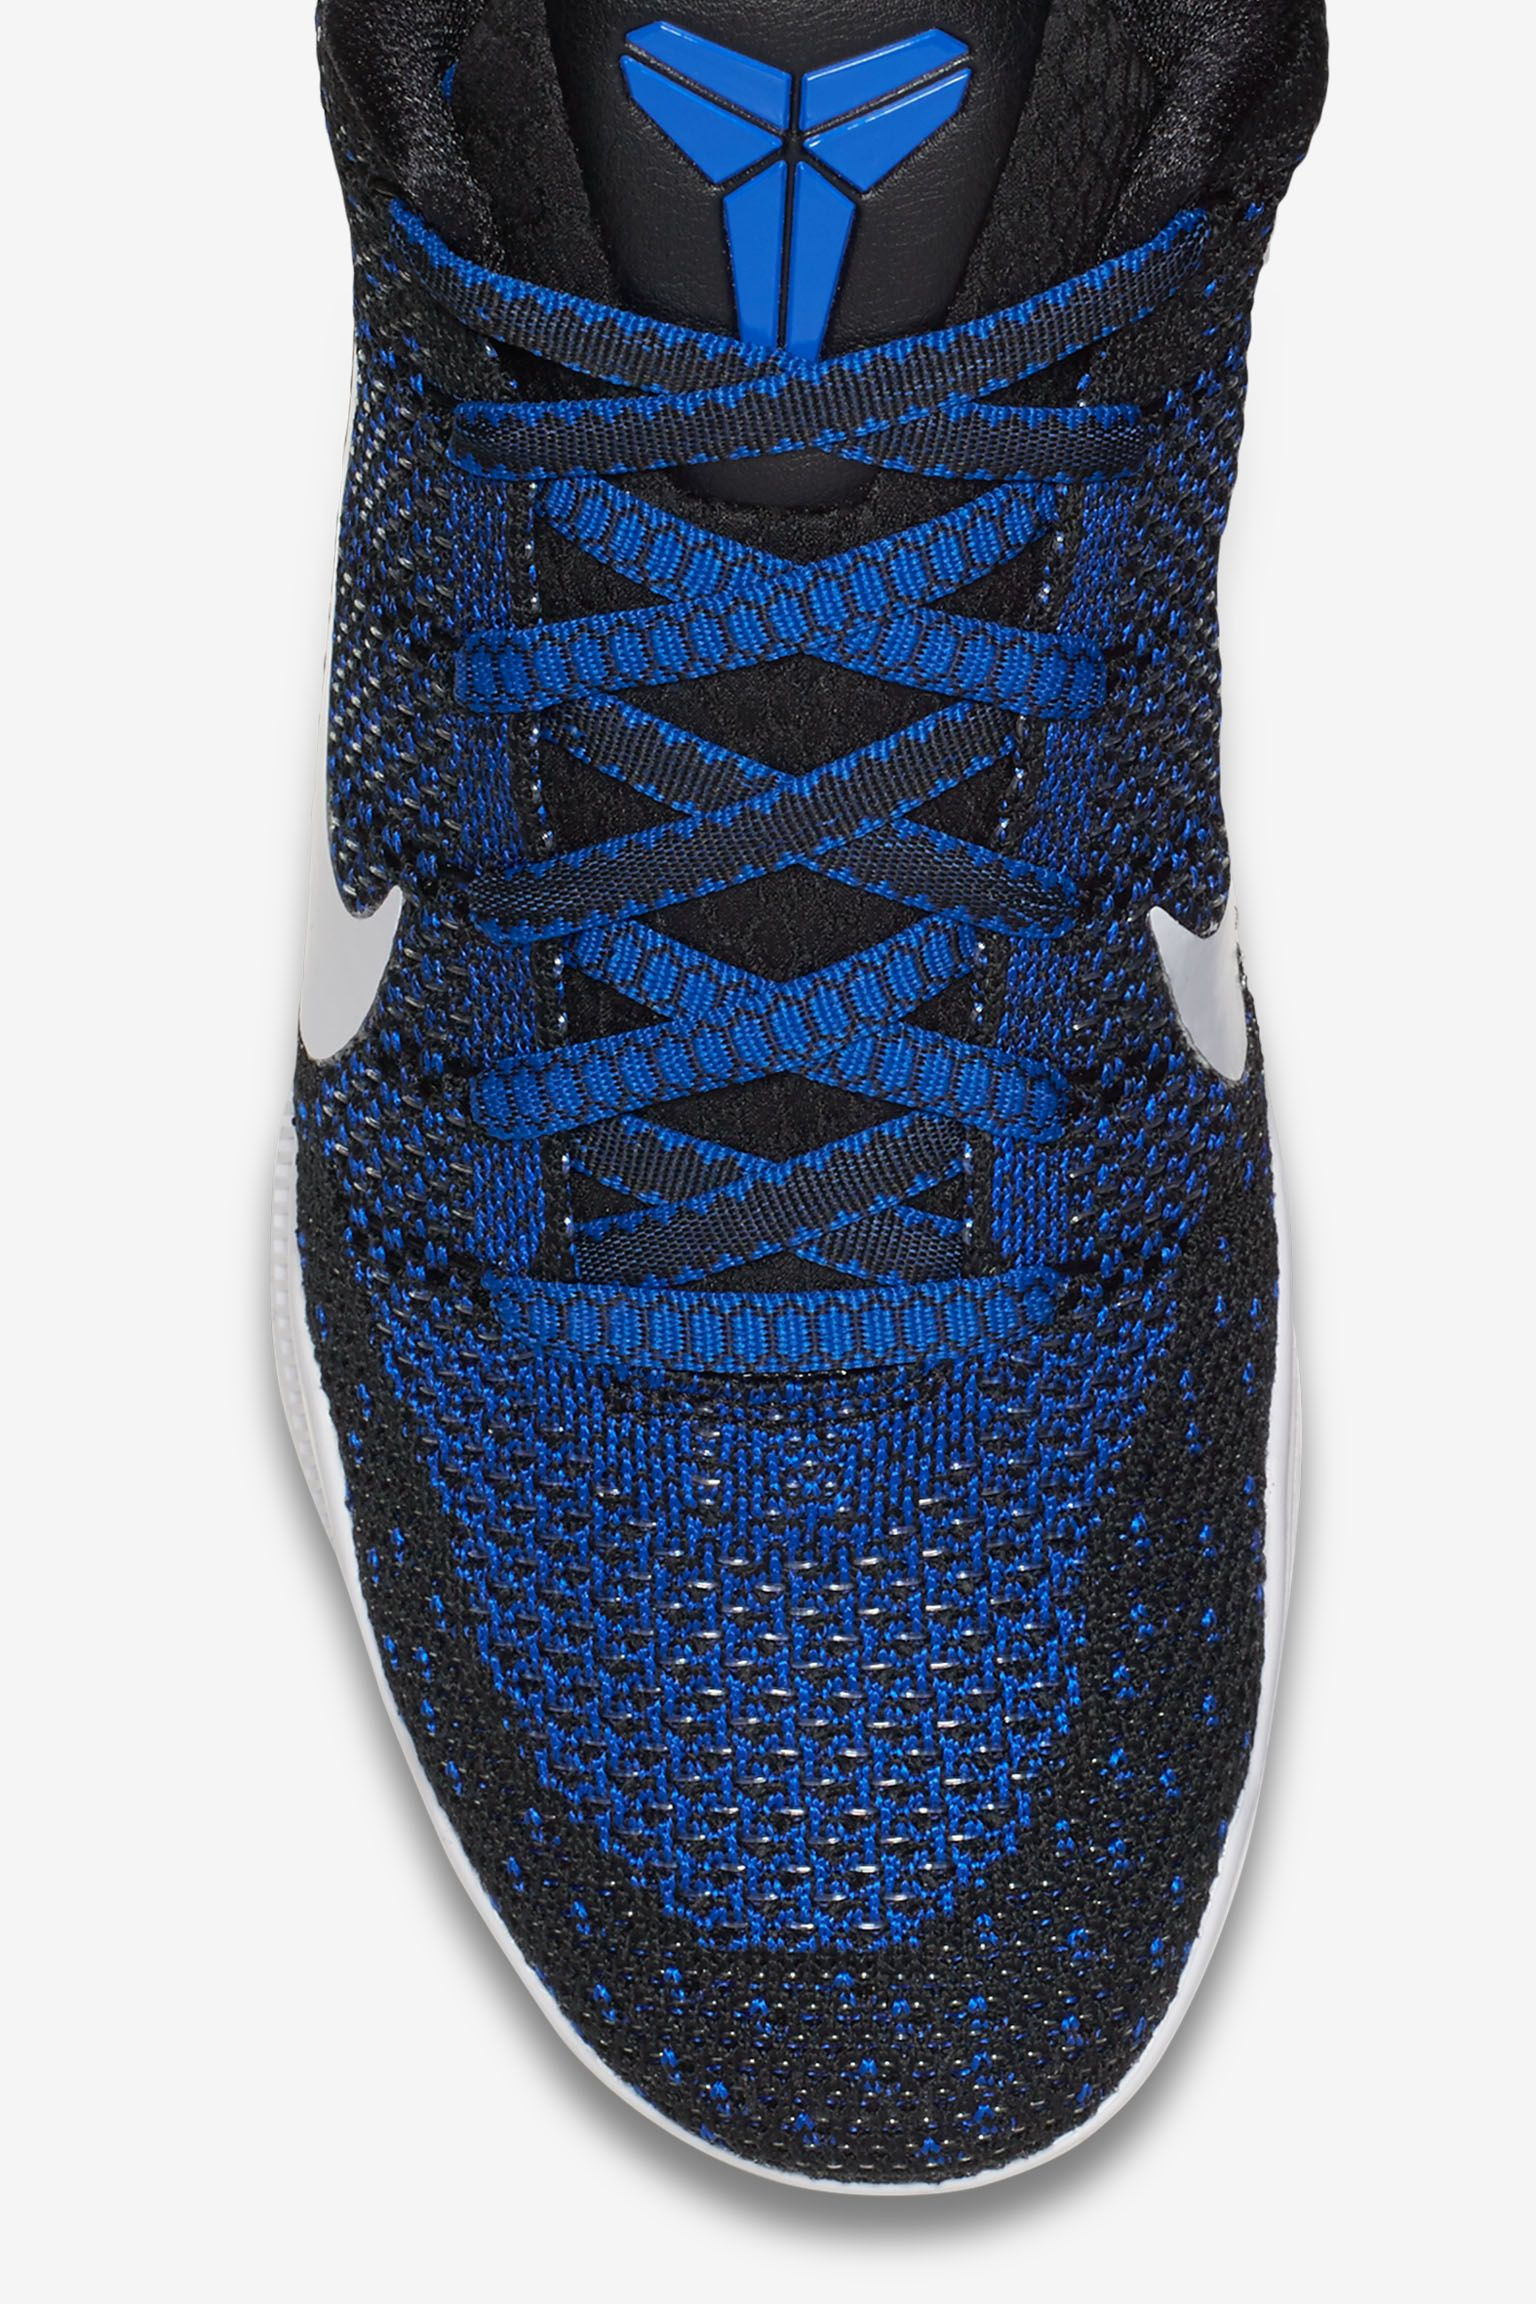 Nike Kobe 11 Elite 'Parker Muse'